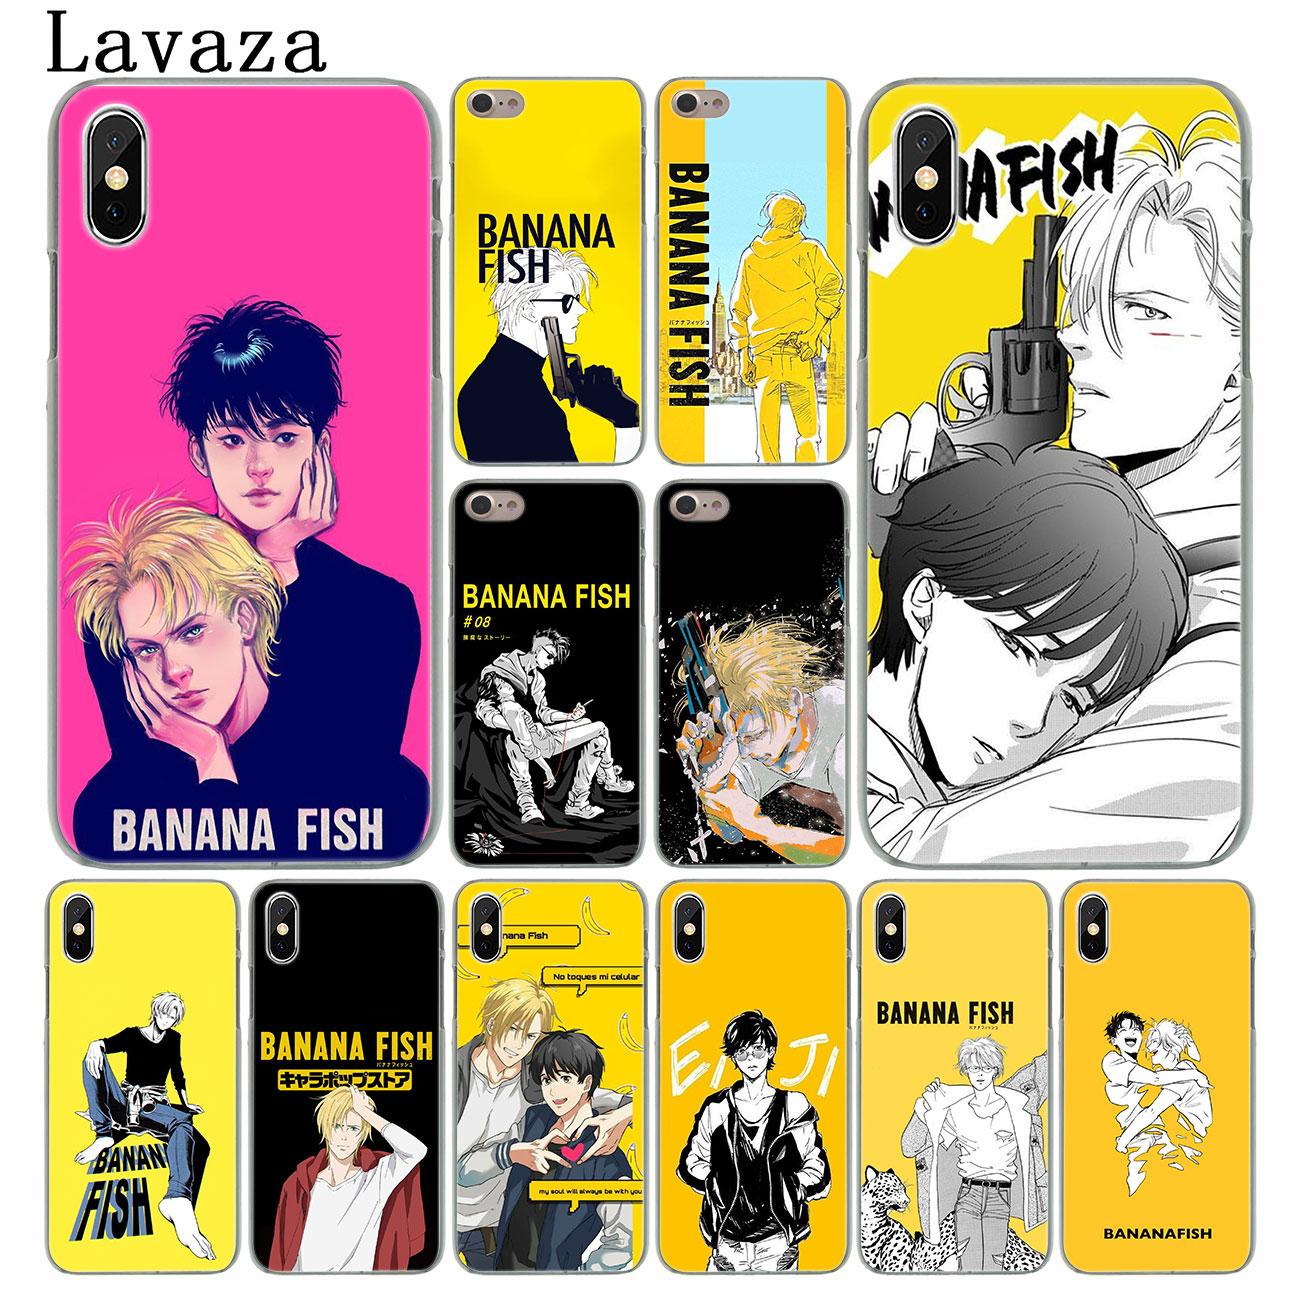 Lavaza Banana pescado Anime teléfono caso duro para el iPhone XR X XS 11 Pro Max 10 7 8 6S 5 5S SE 4S 4